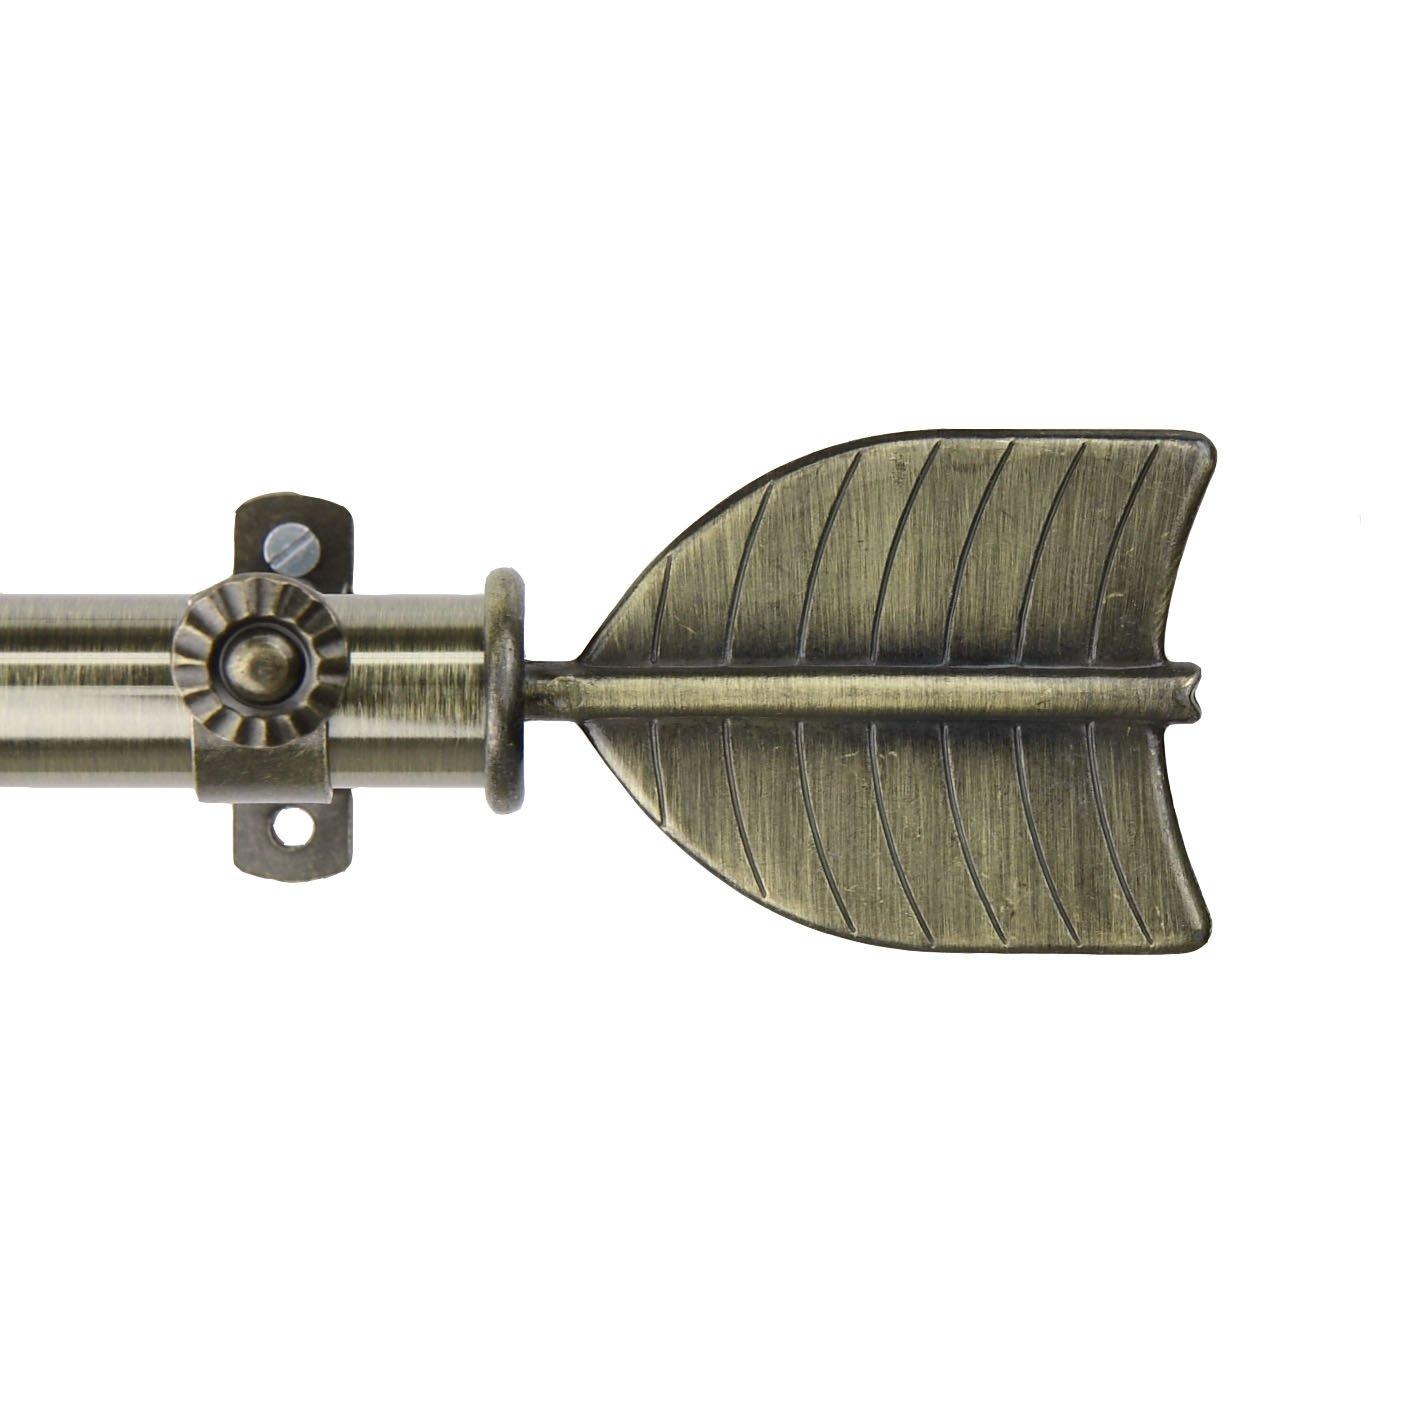 Feather Curtain Rod 48-84 inch - Antique Brass   B00DEYAQT4